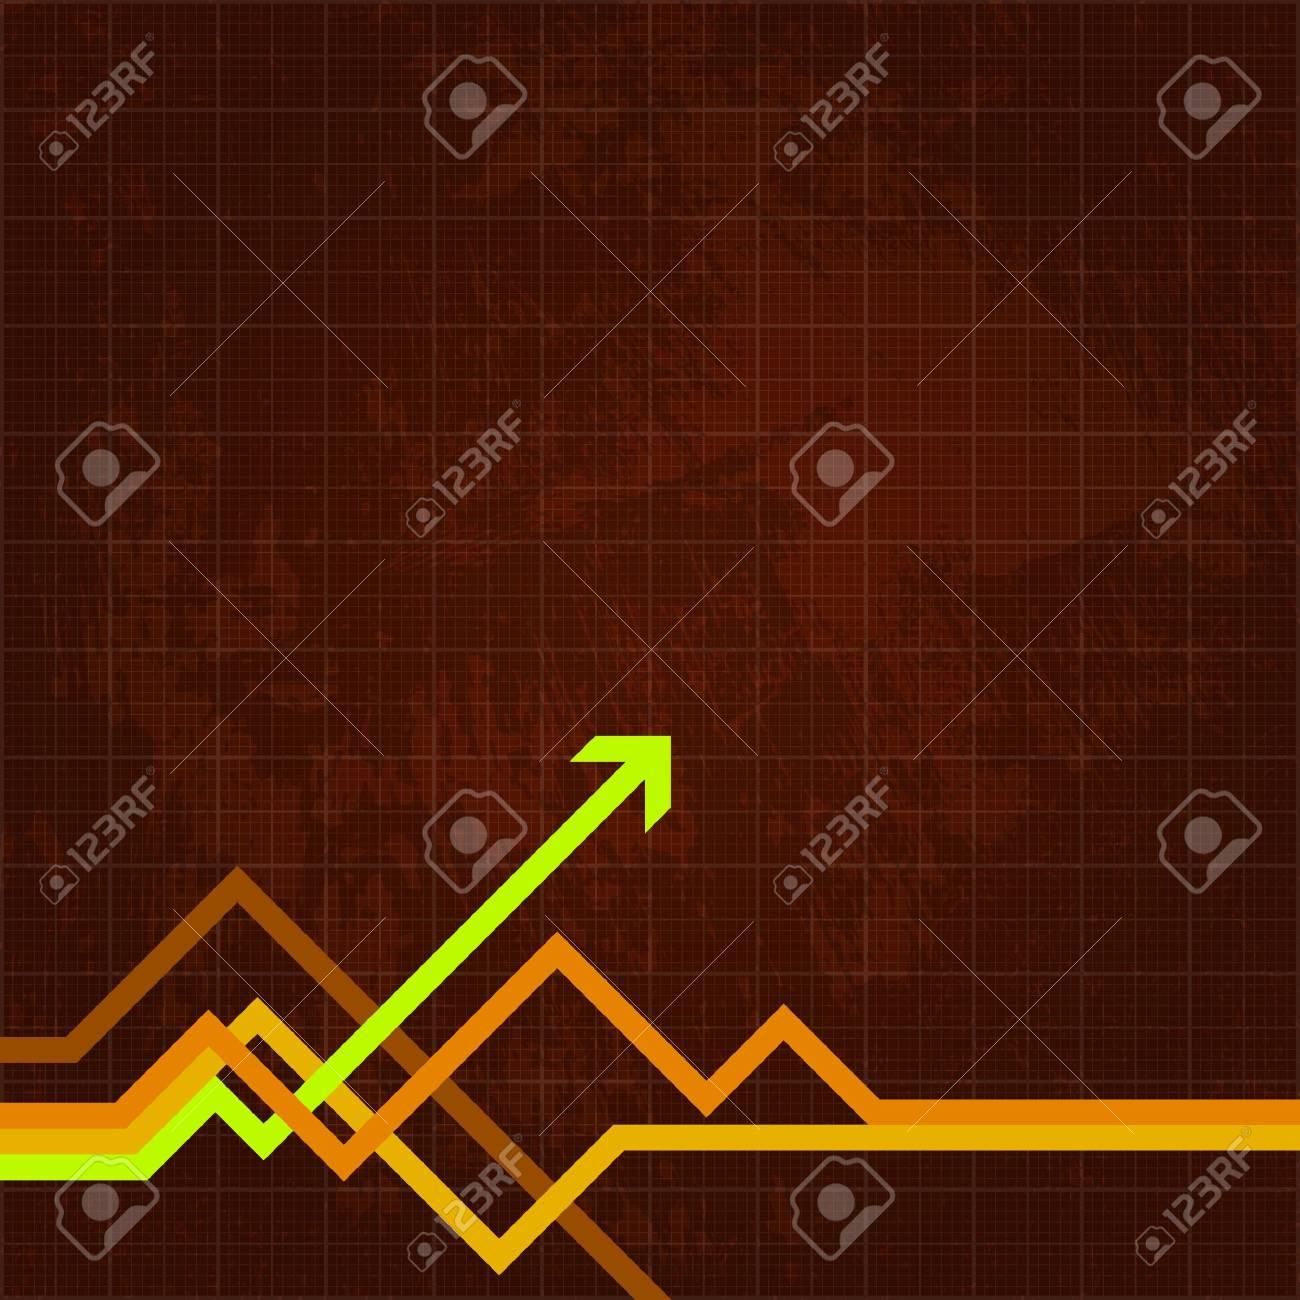 Green arrow pushing forward on grungy chart - 6722673